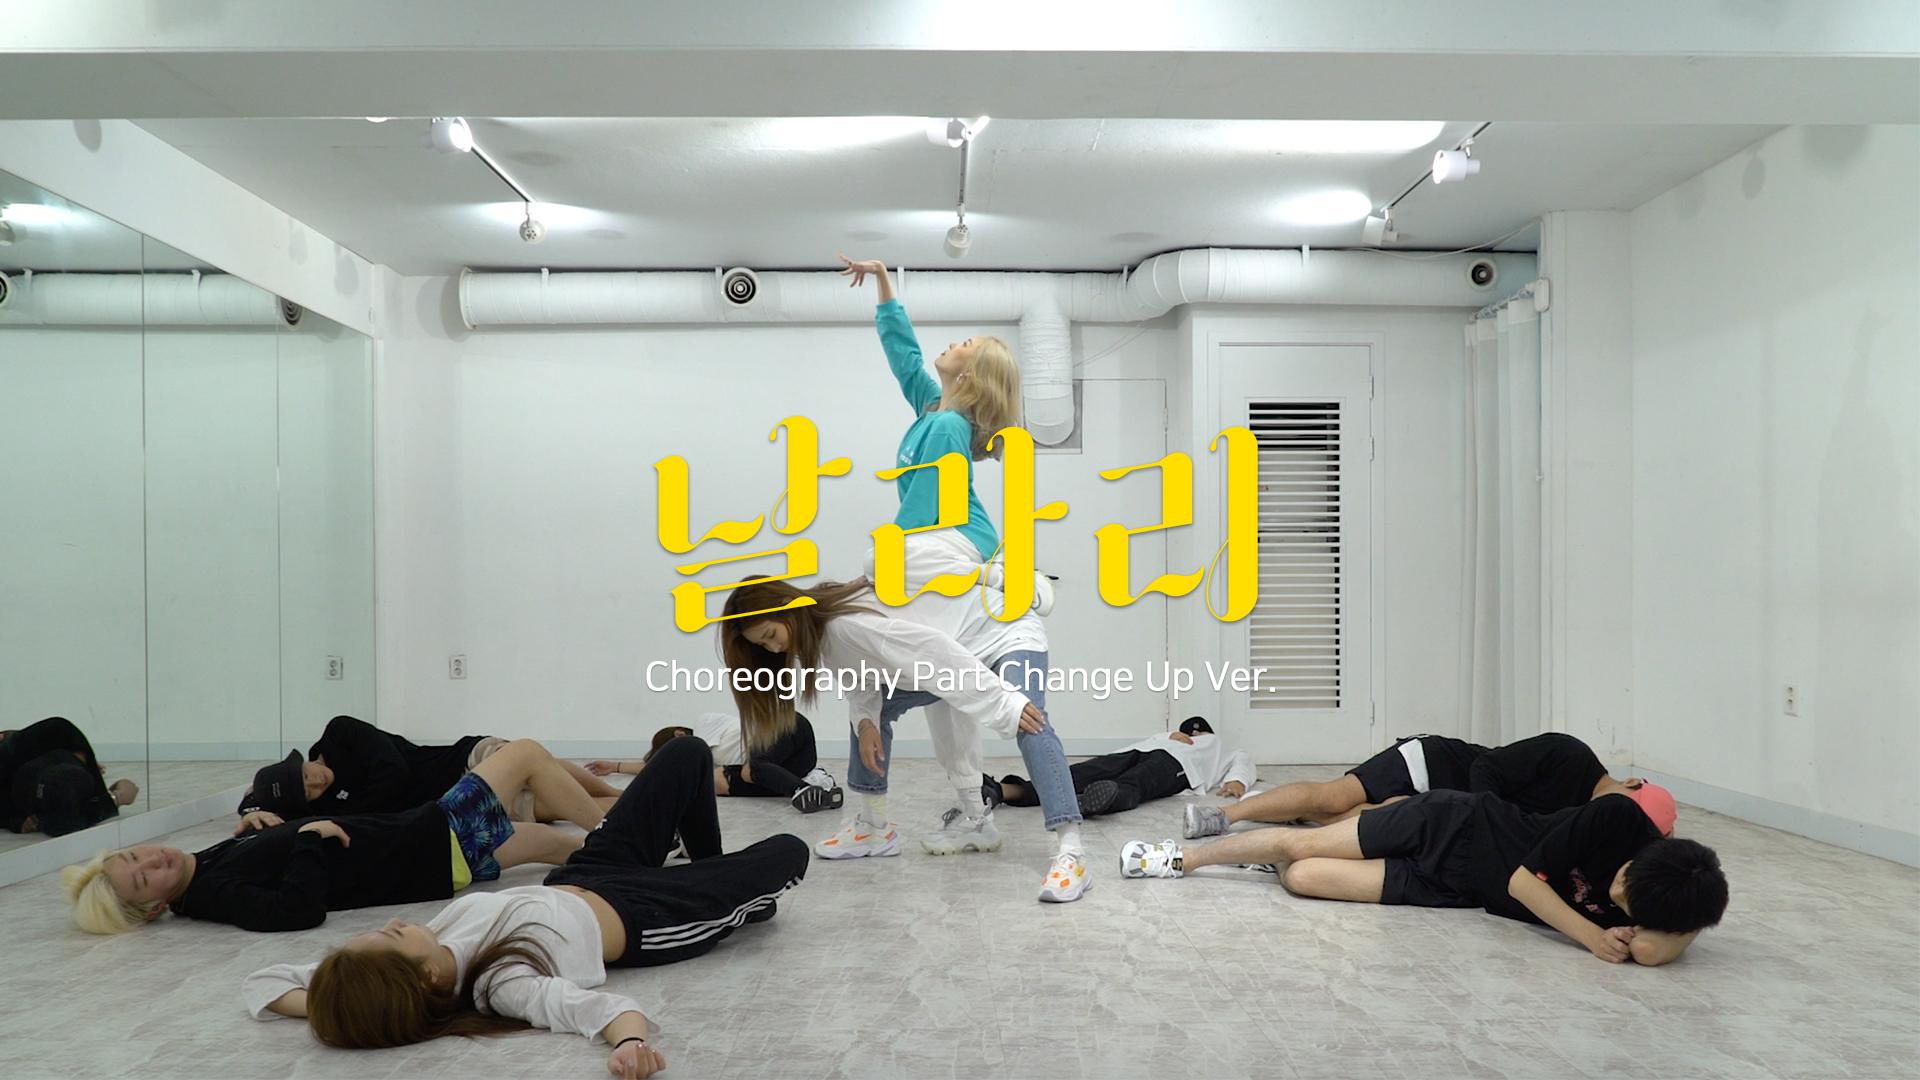 [Choreography Practice] 선미(SUNMI) - 날라리(LALALAY) 안무 연습 영상 (Part Change Up Ver.)